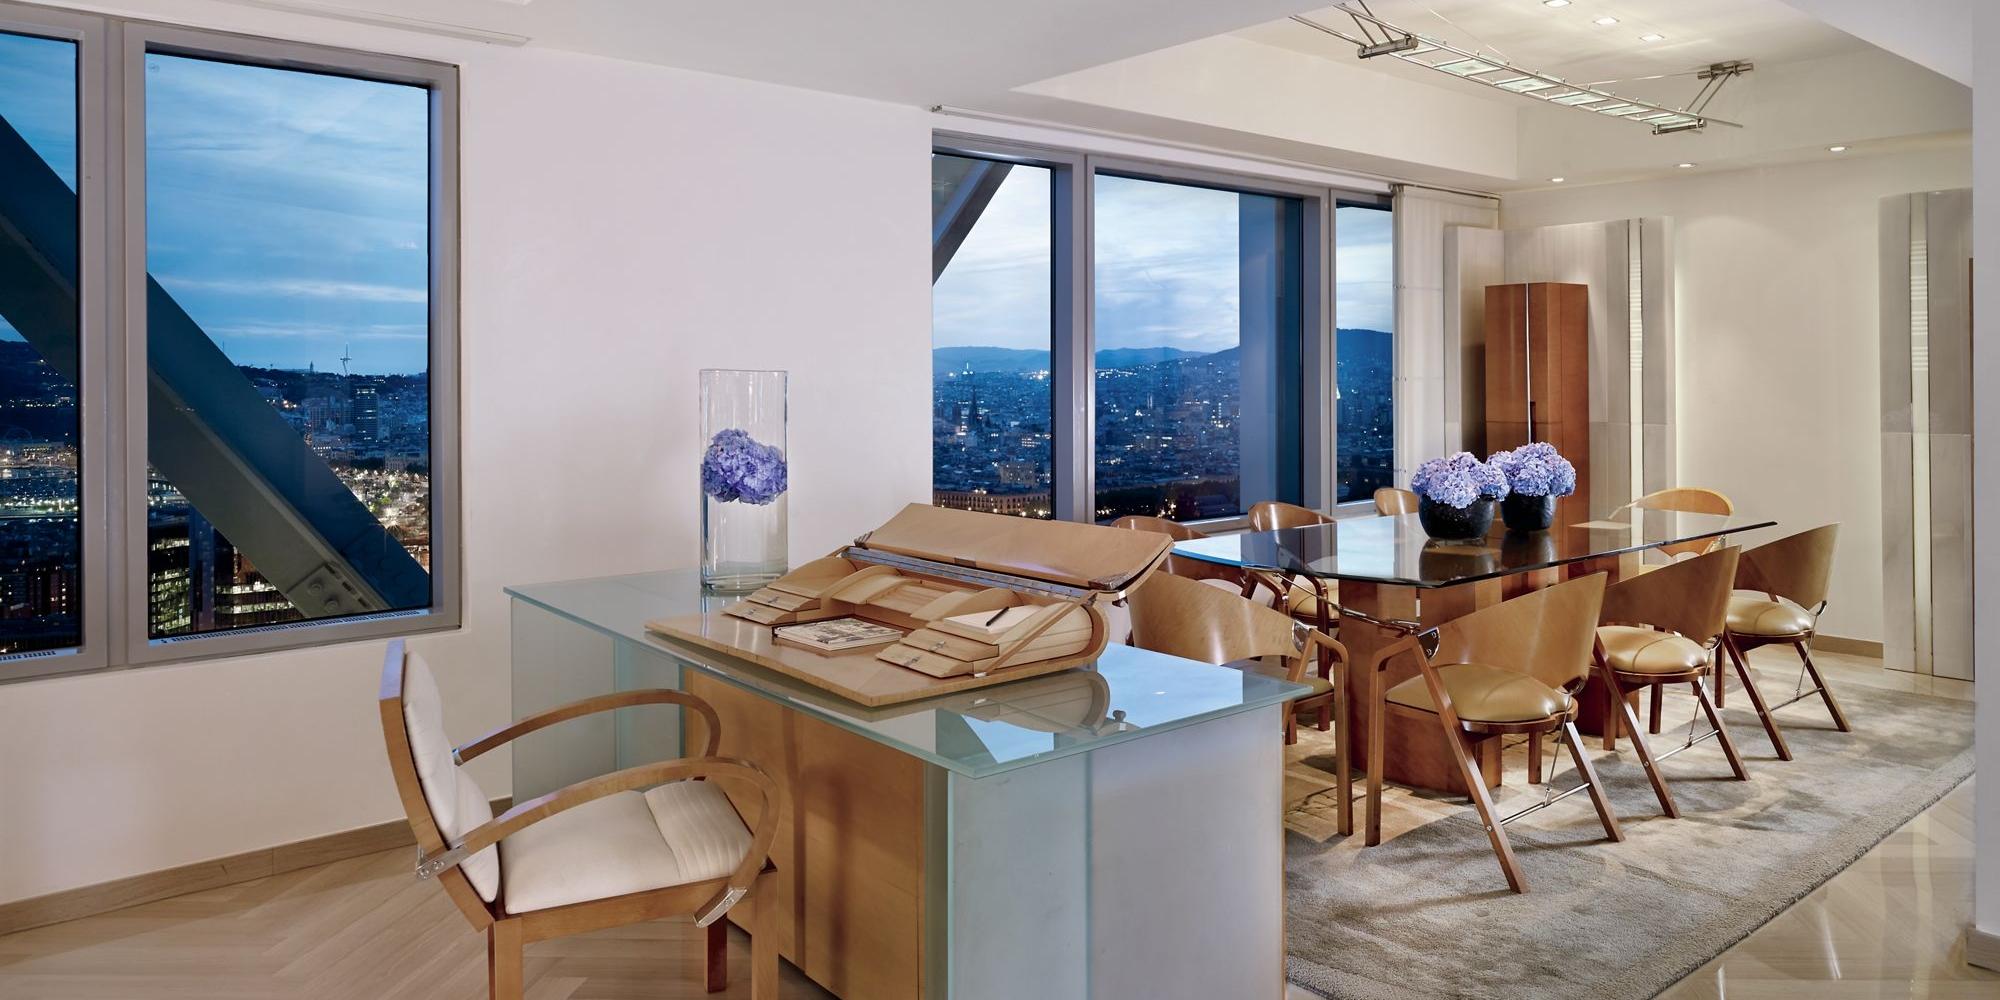 Barcelona - Arts Barcelona 2 Bedroom Penthouse